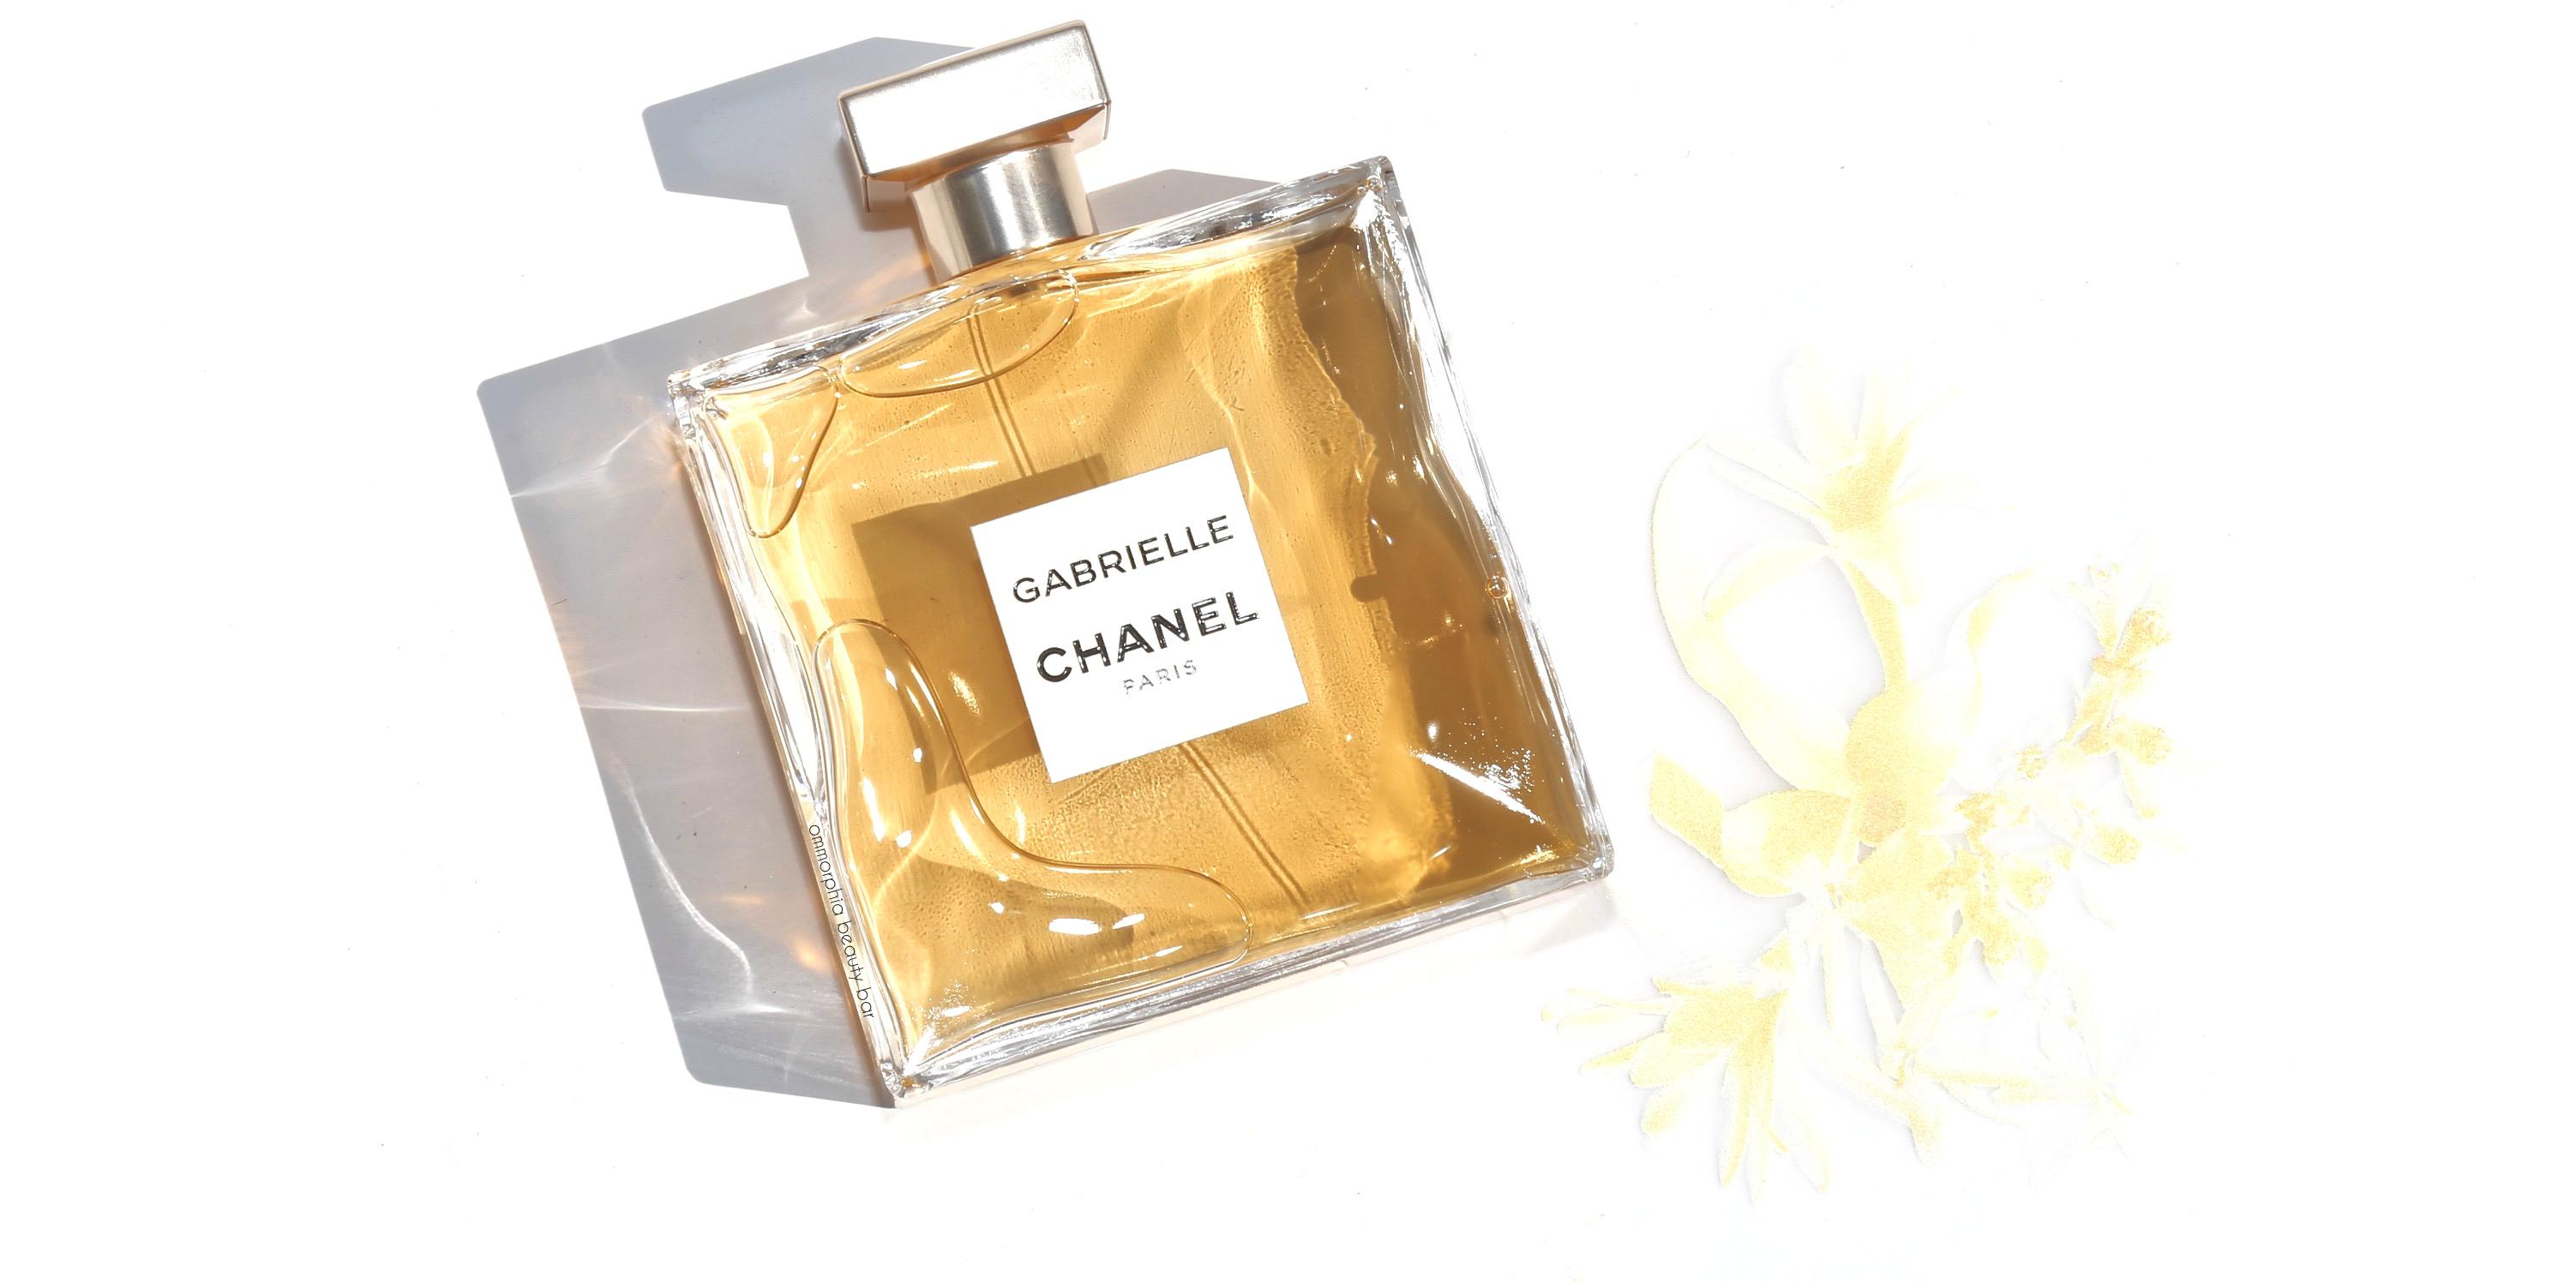 chanel gabrielle perfume price. gabrielle, alongside the ethereally beautiful catherine deneuve chanel gabrielle perfume price